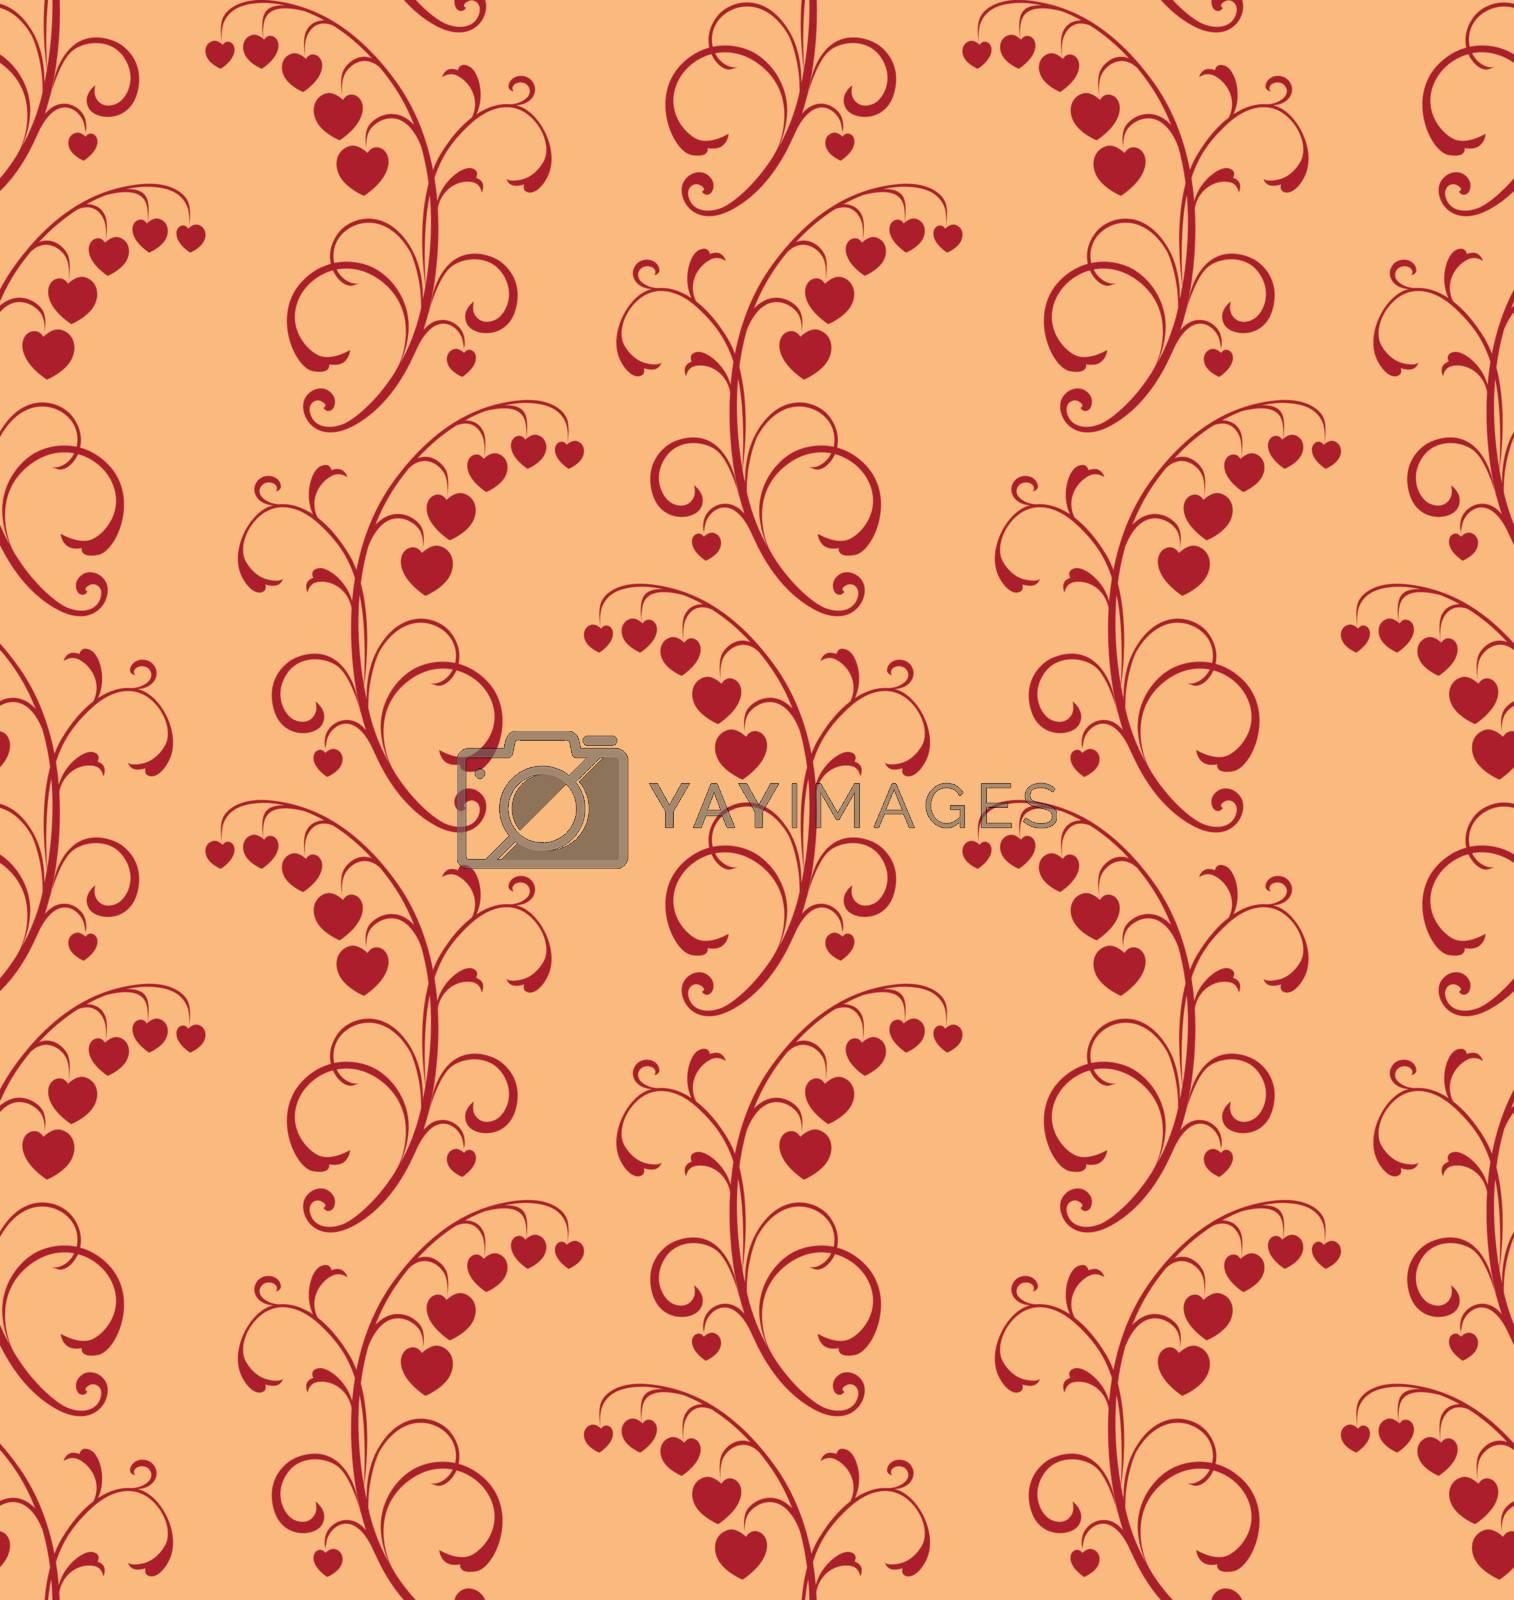 Floral background by ESSL